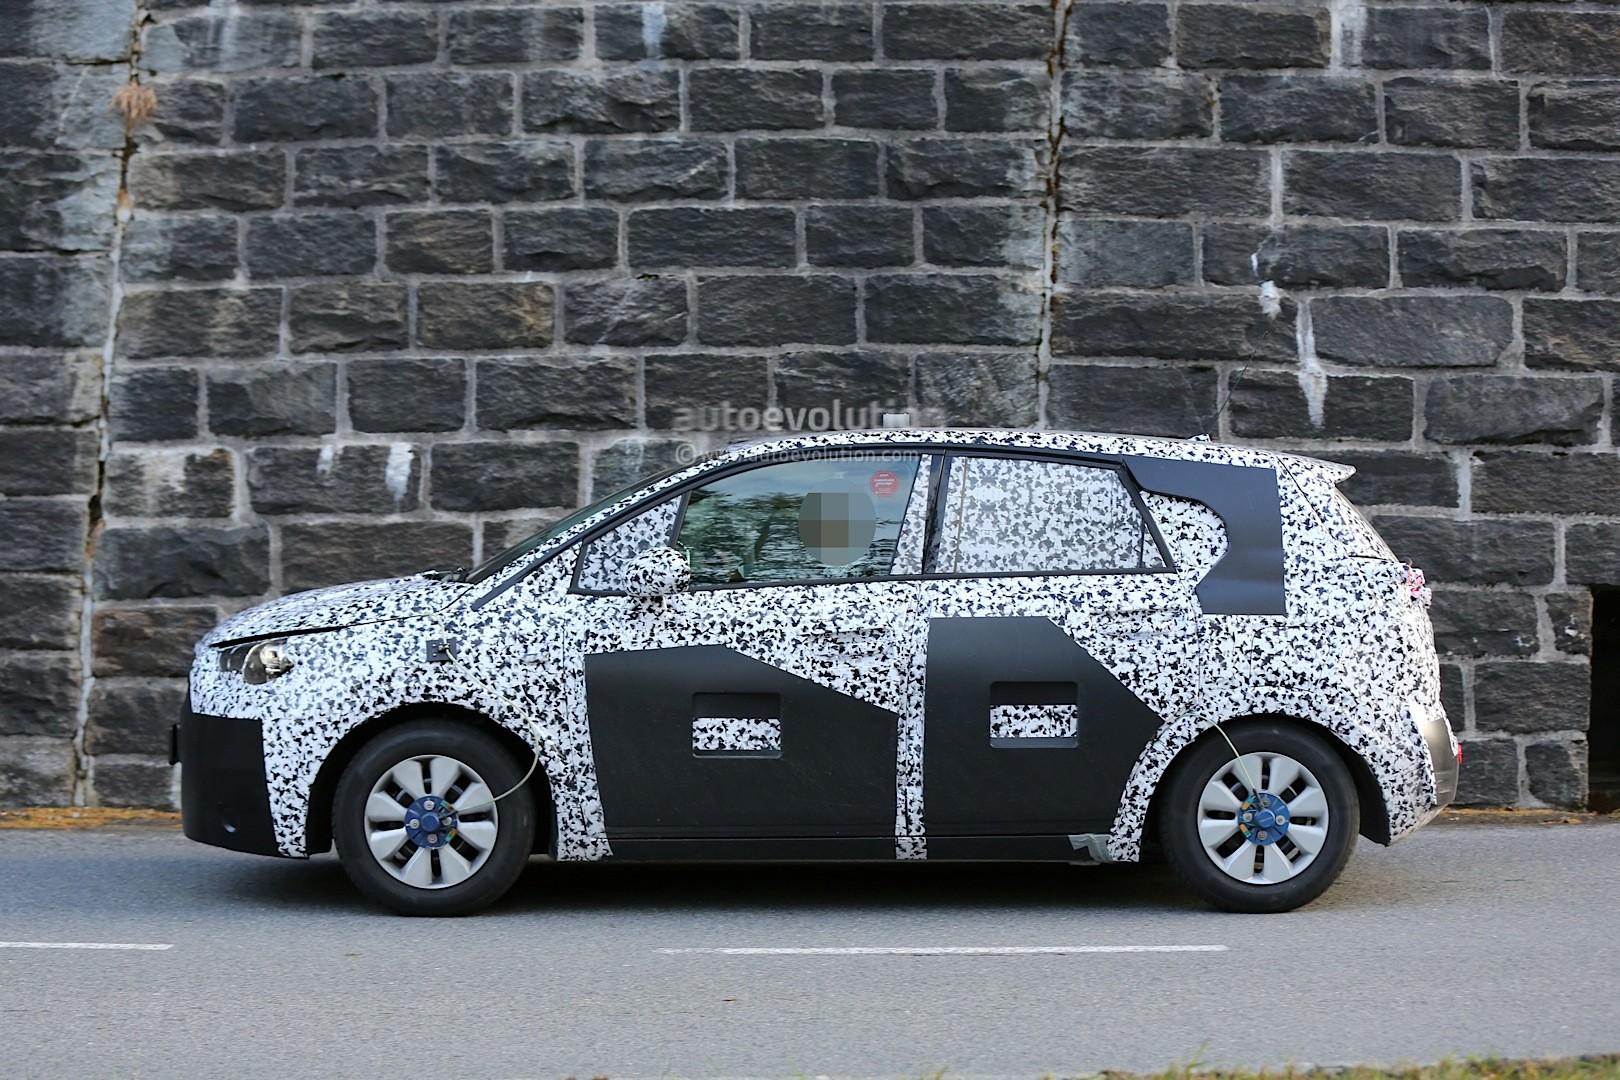 Spyshots: 2017 Opel Meriva Prototype Shows New Details - autoevolution